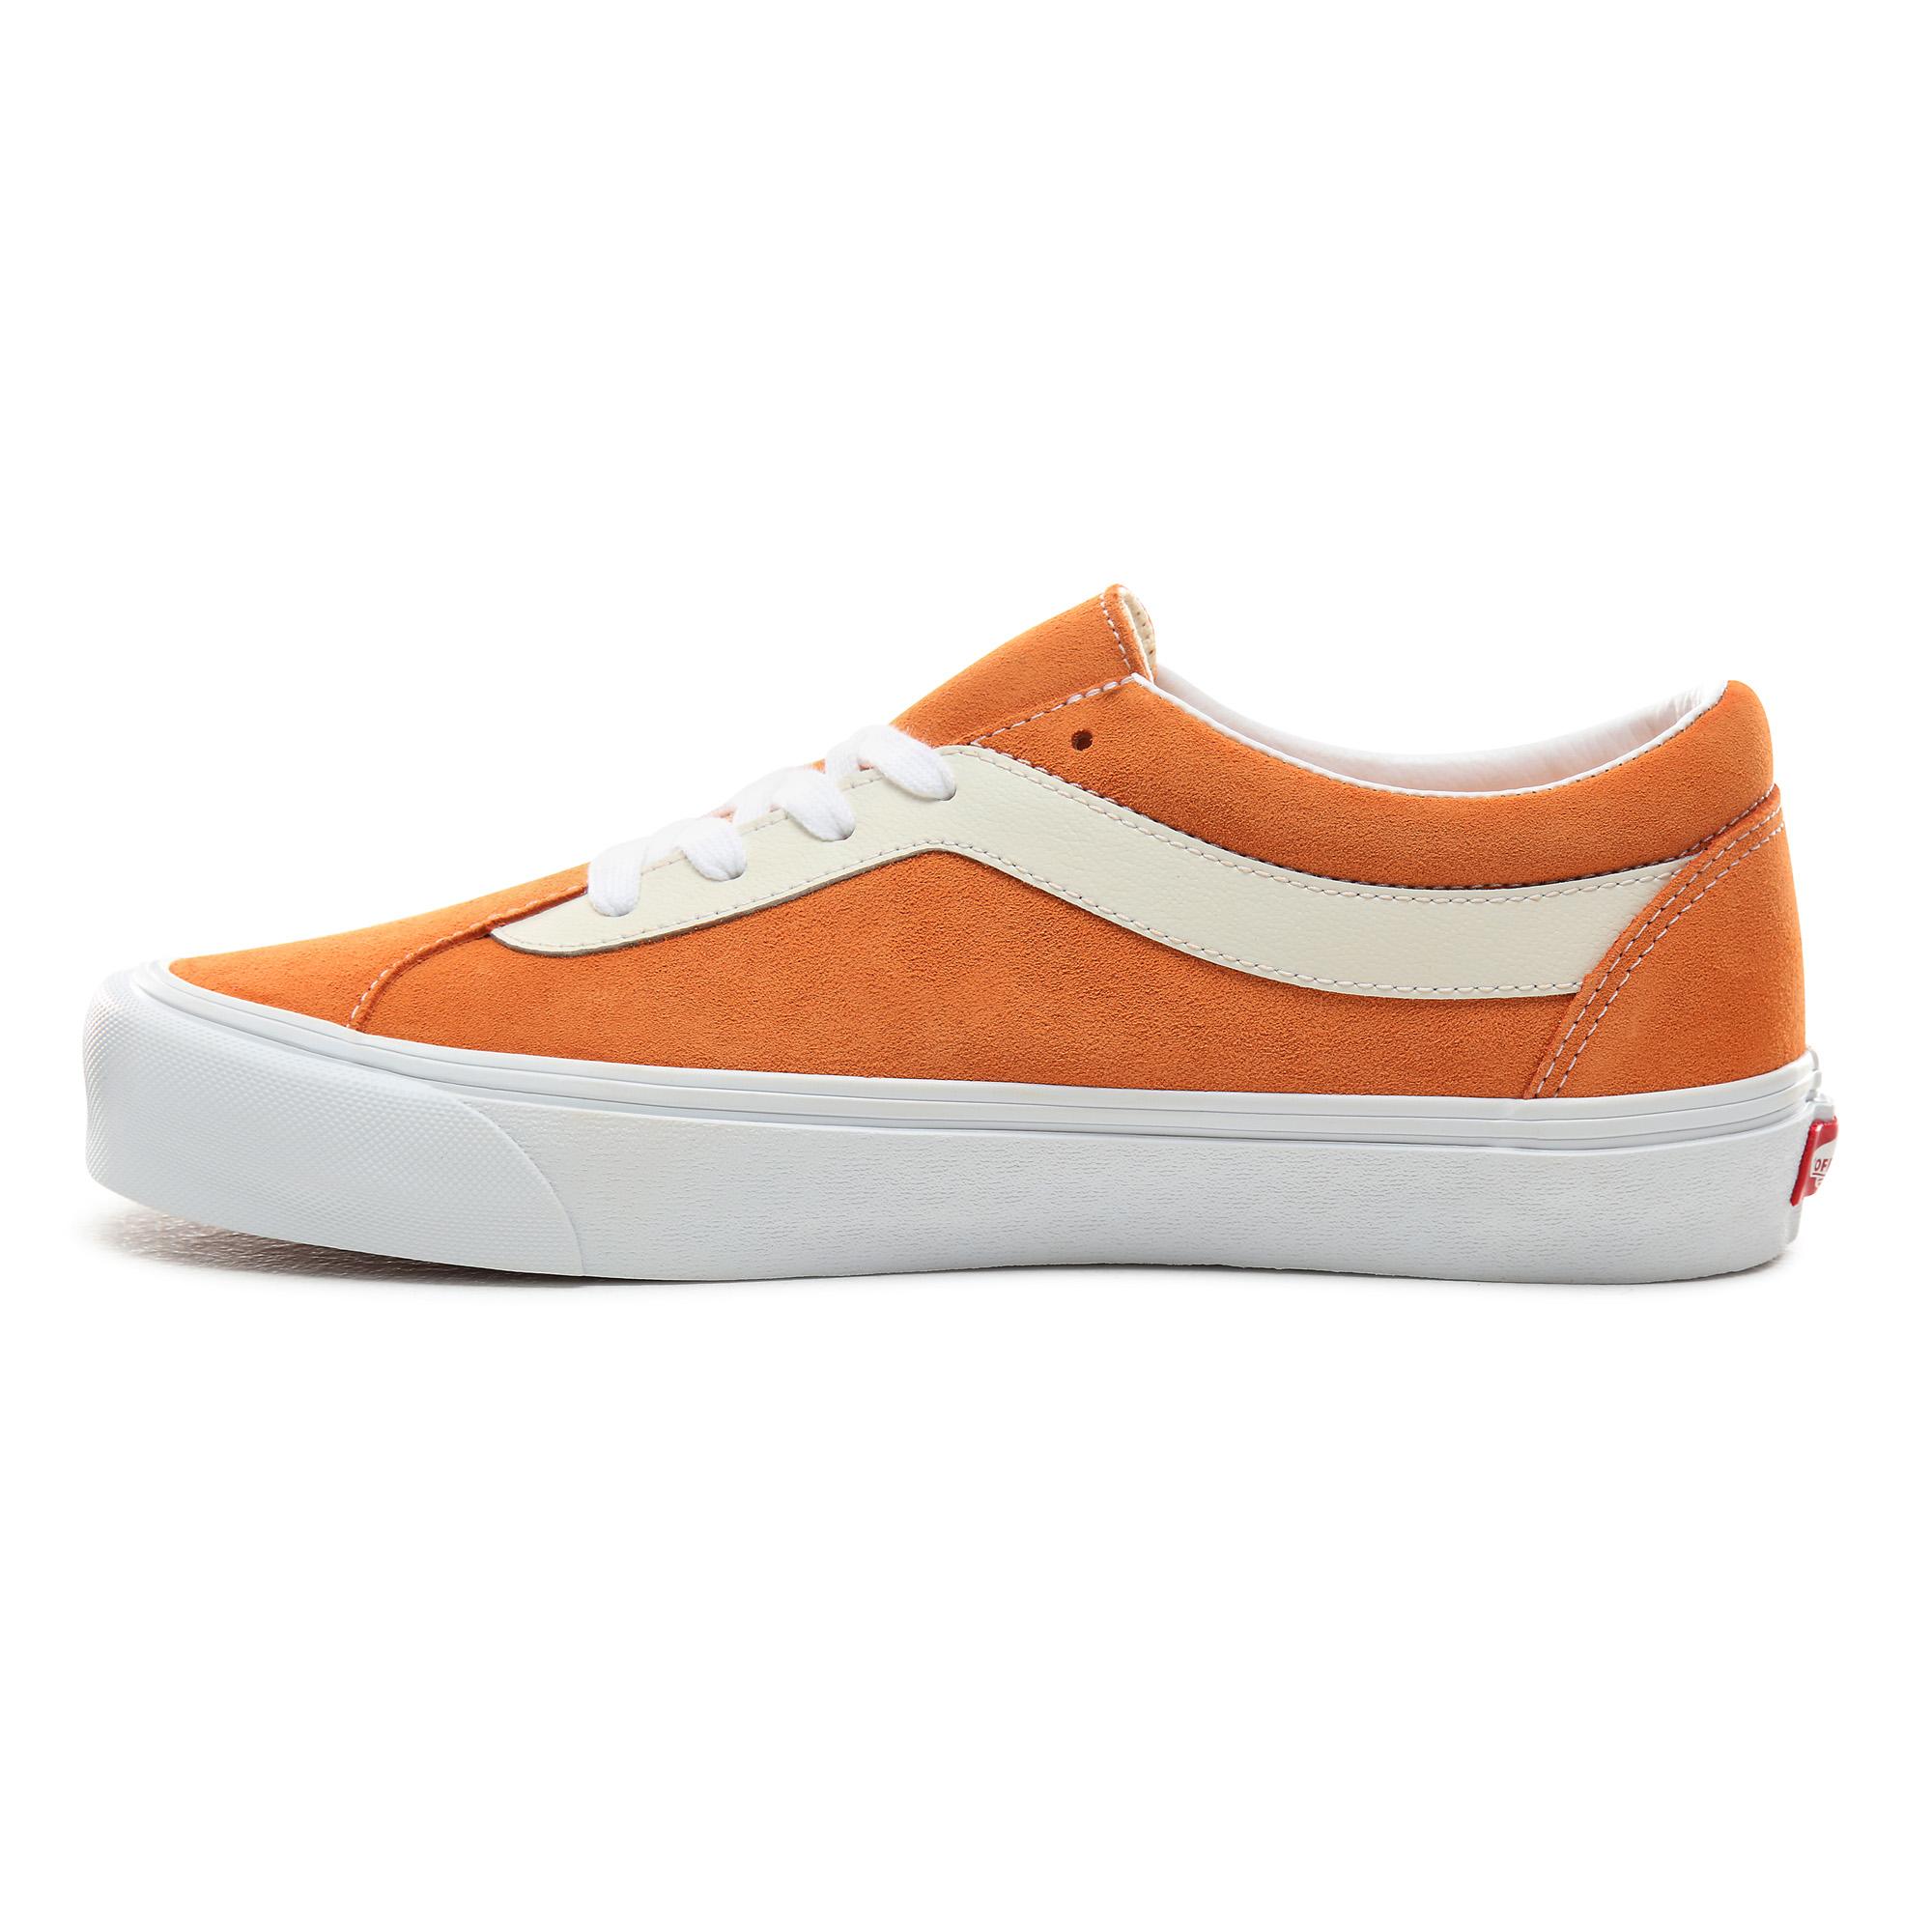 Фото 3 - Кеды Bold Ni оранжевого цвета